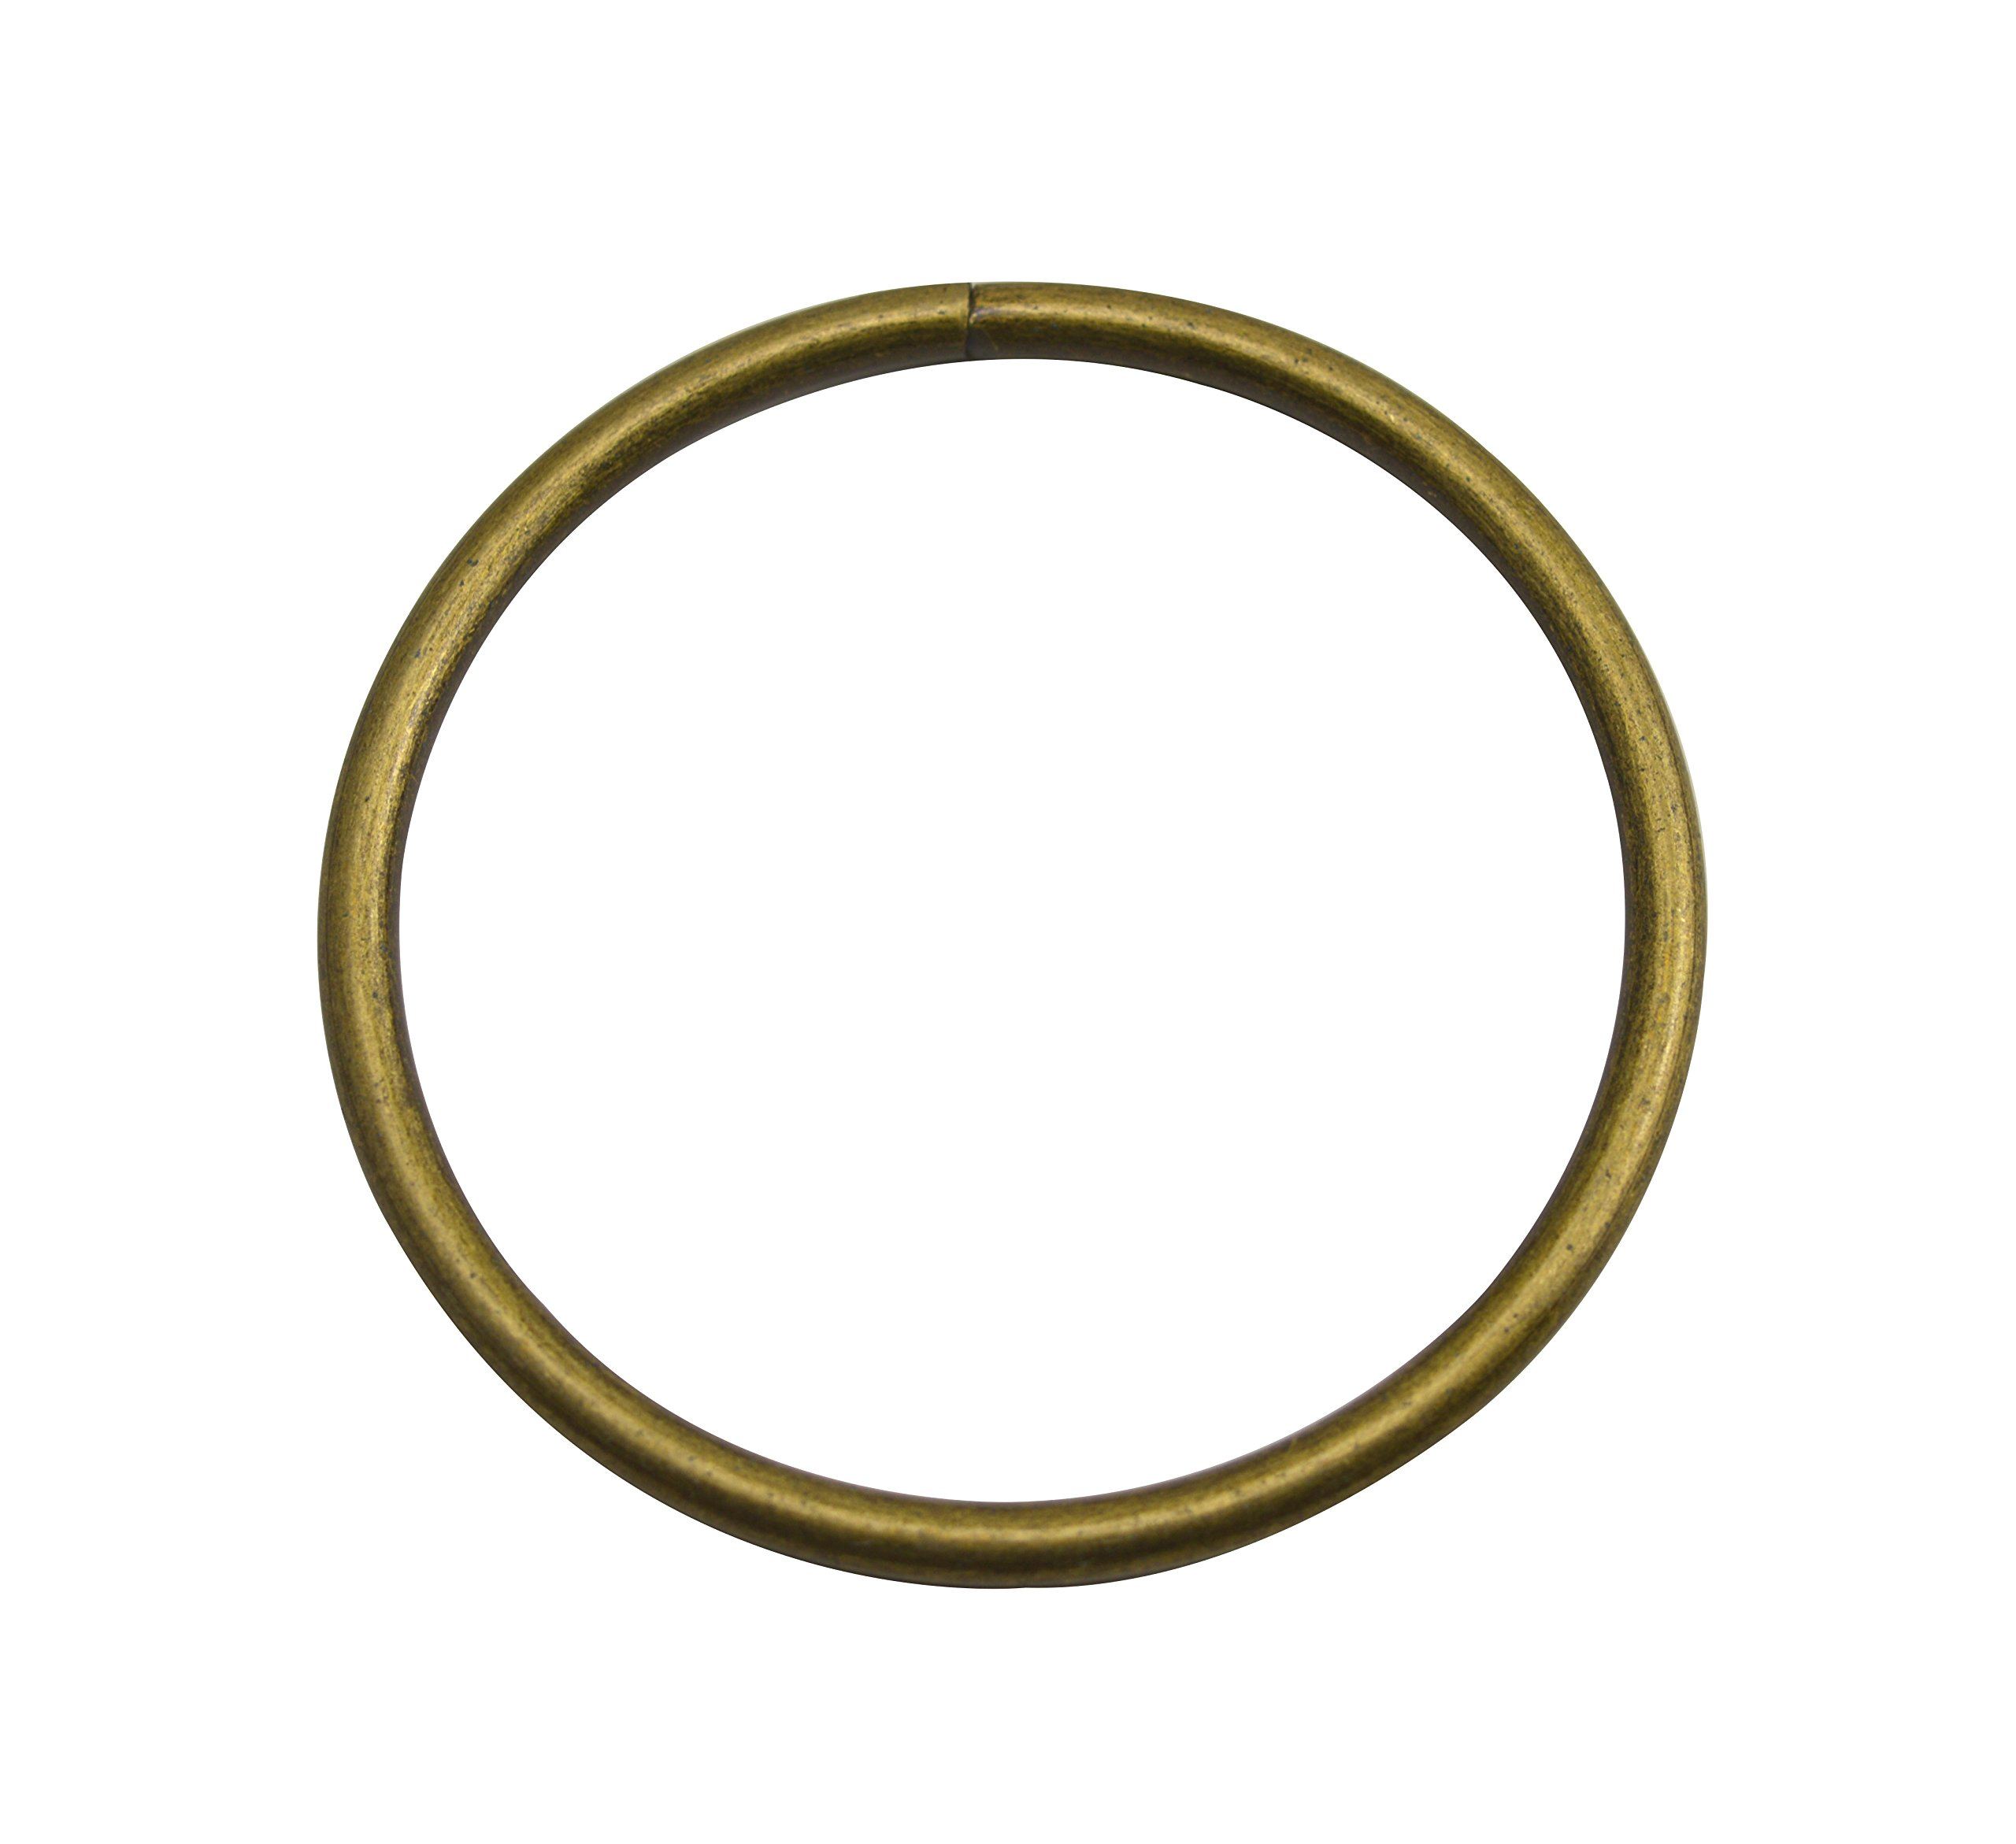 Wuuycoky Bronze 3'' Inner Diameter O-Rings Rings Non Welded Strap Adjuster Webbing Belts Buckle Pack of 10